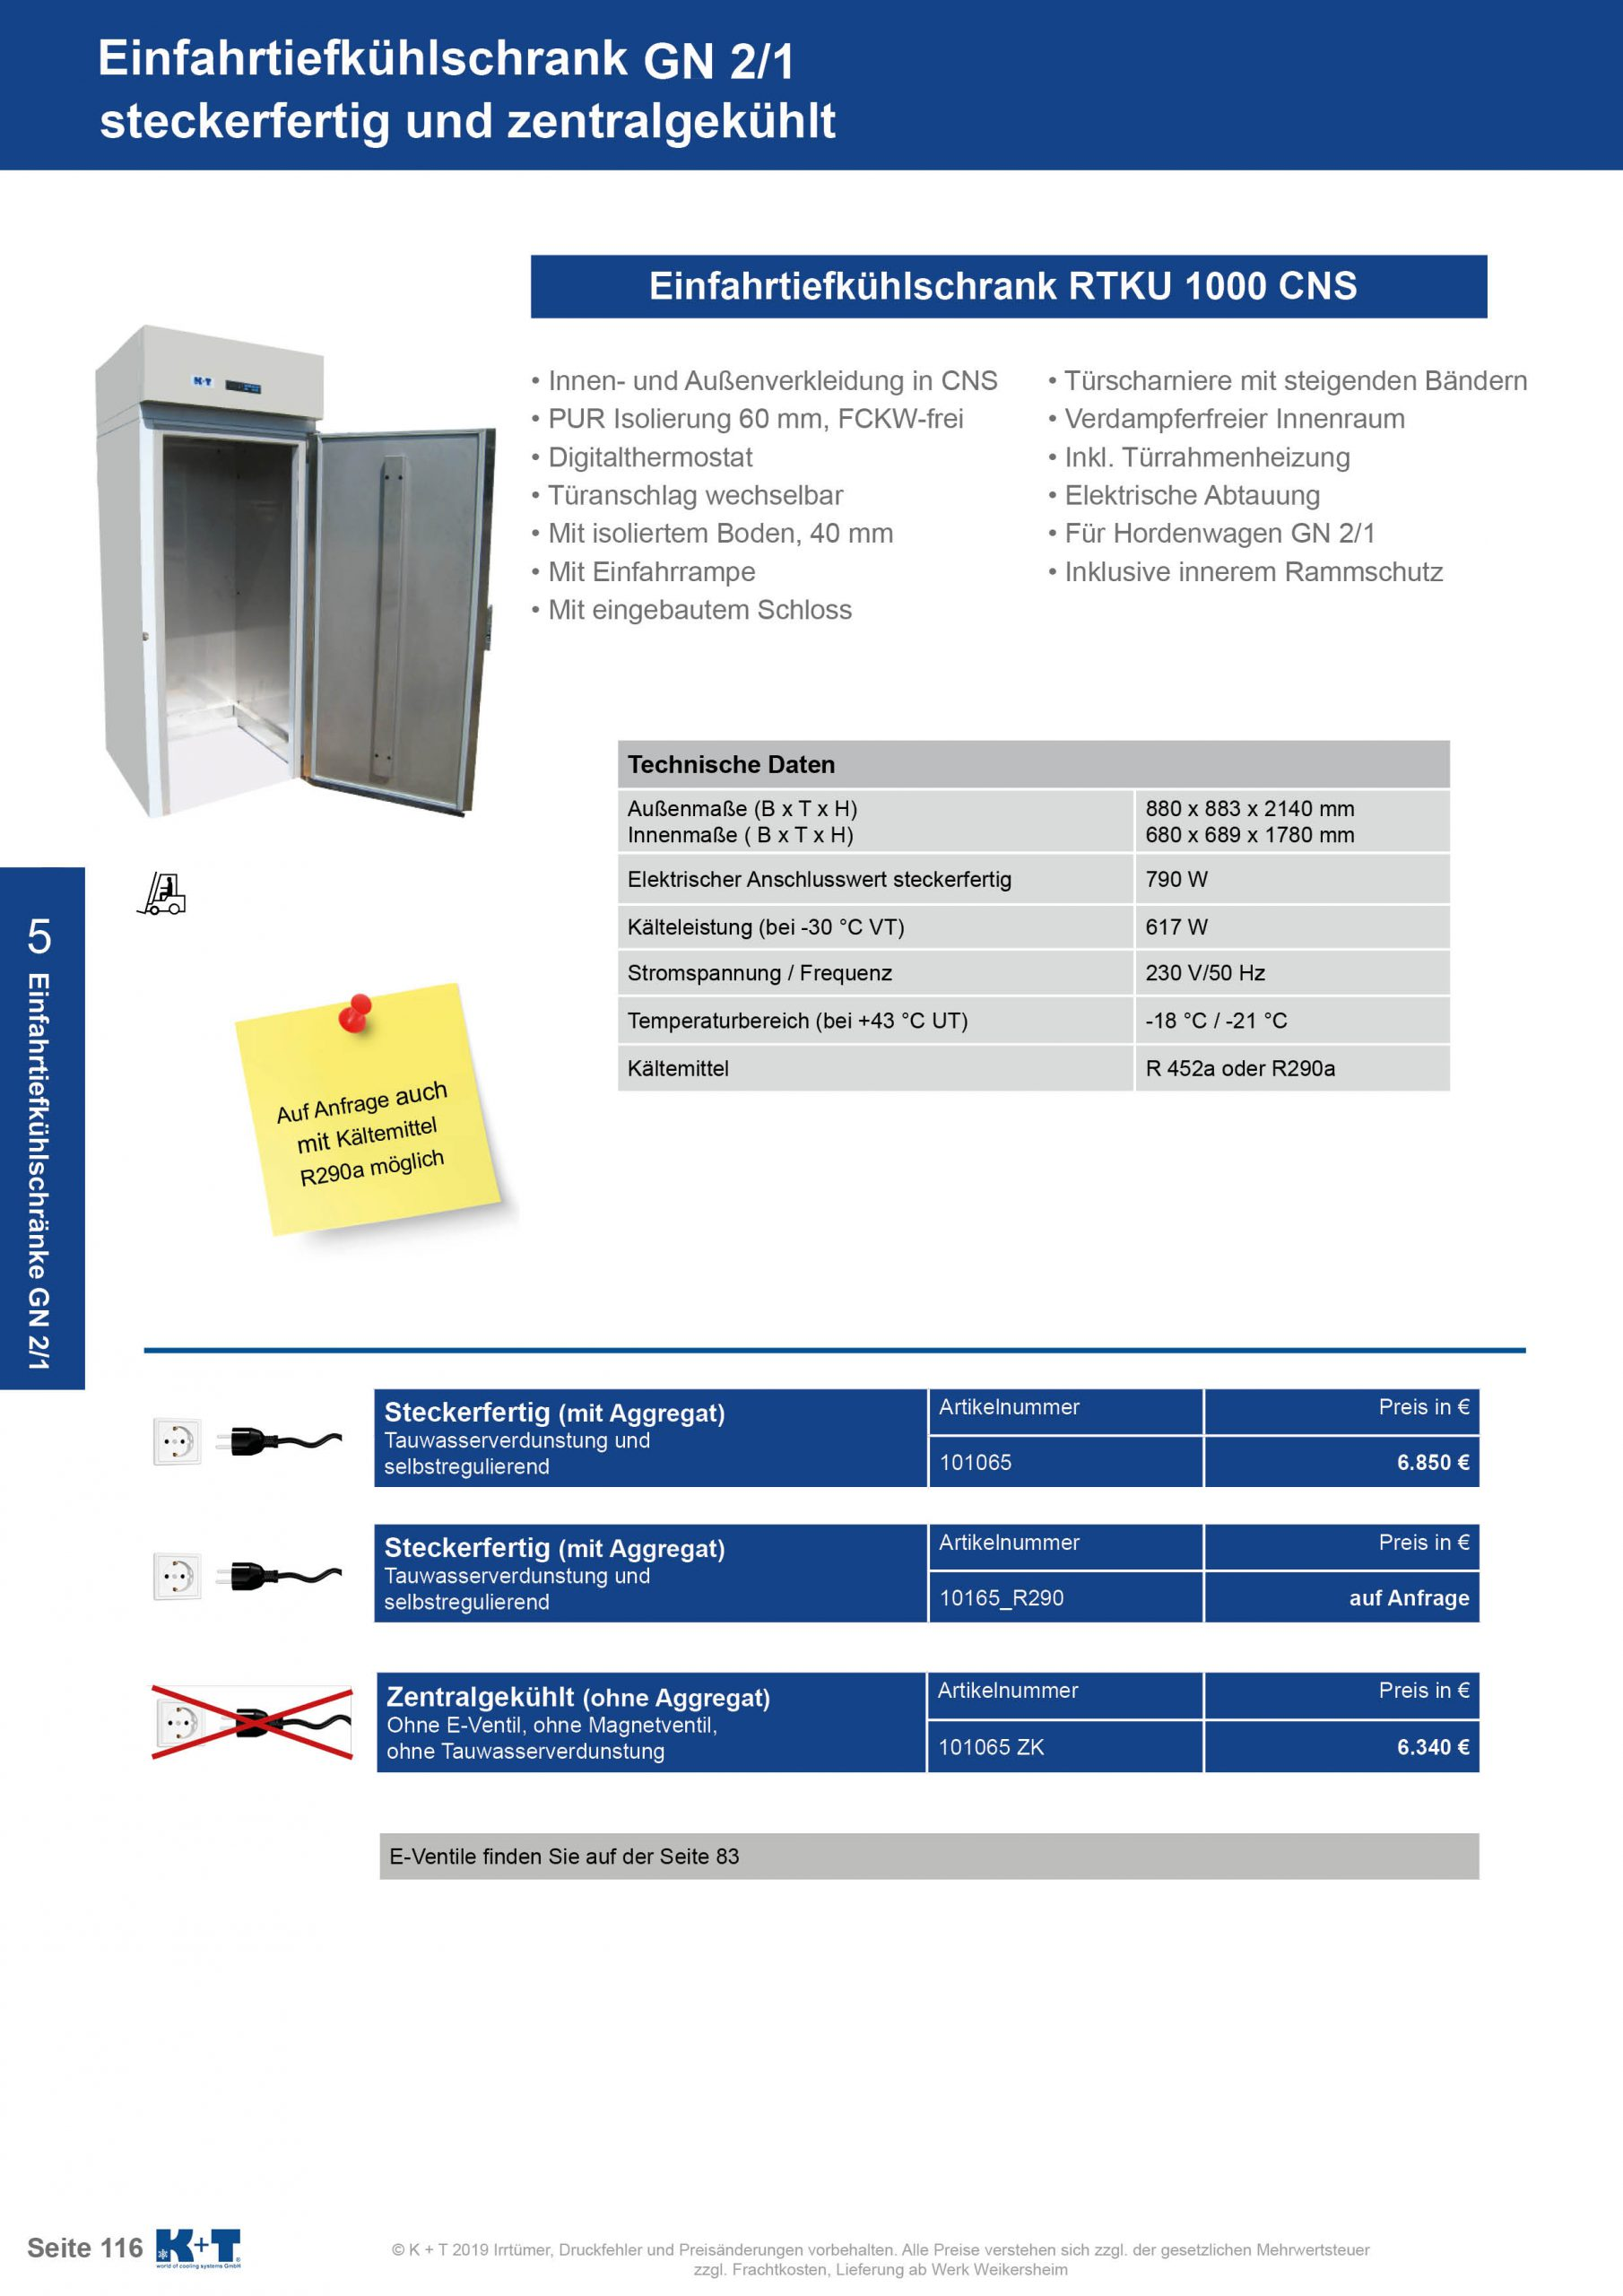 Einfahrtiefkühlschrank GN 2_1 steckerfertig